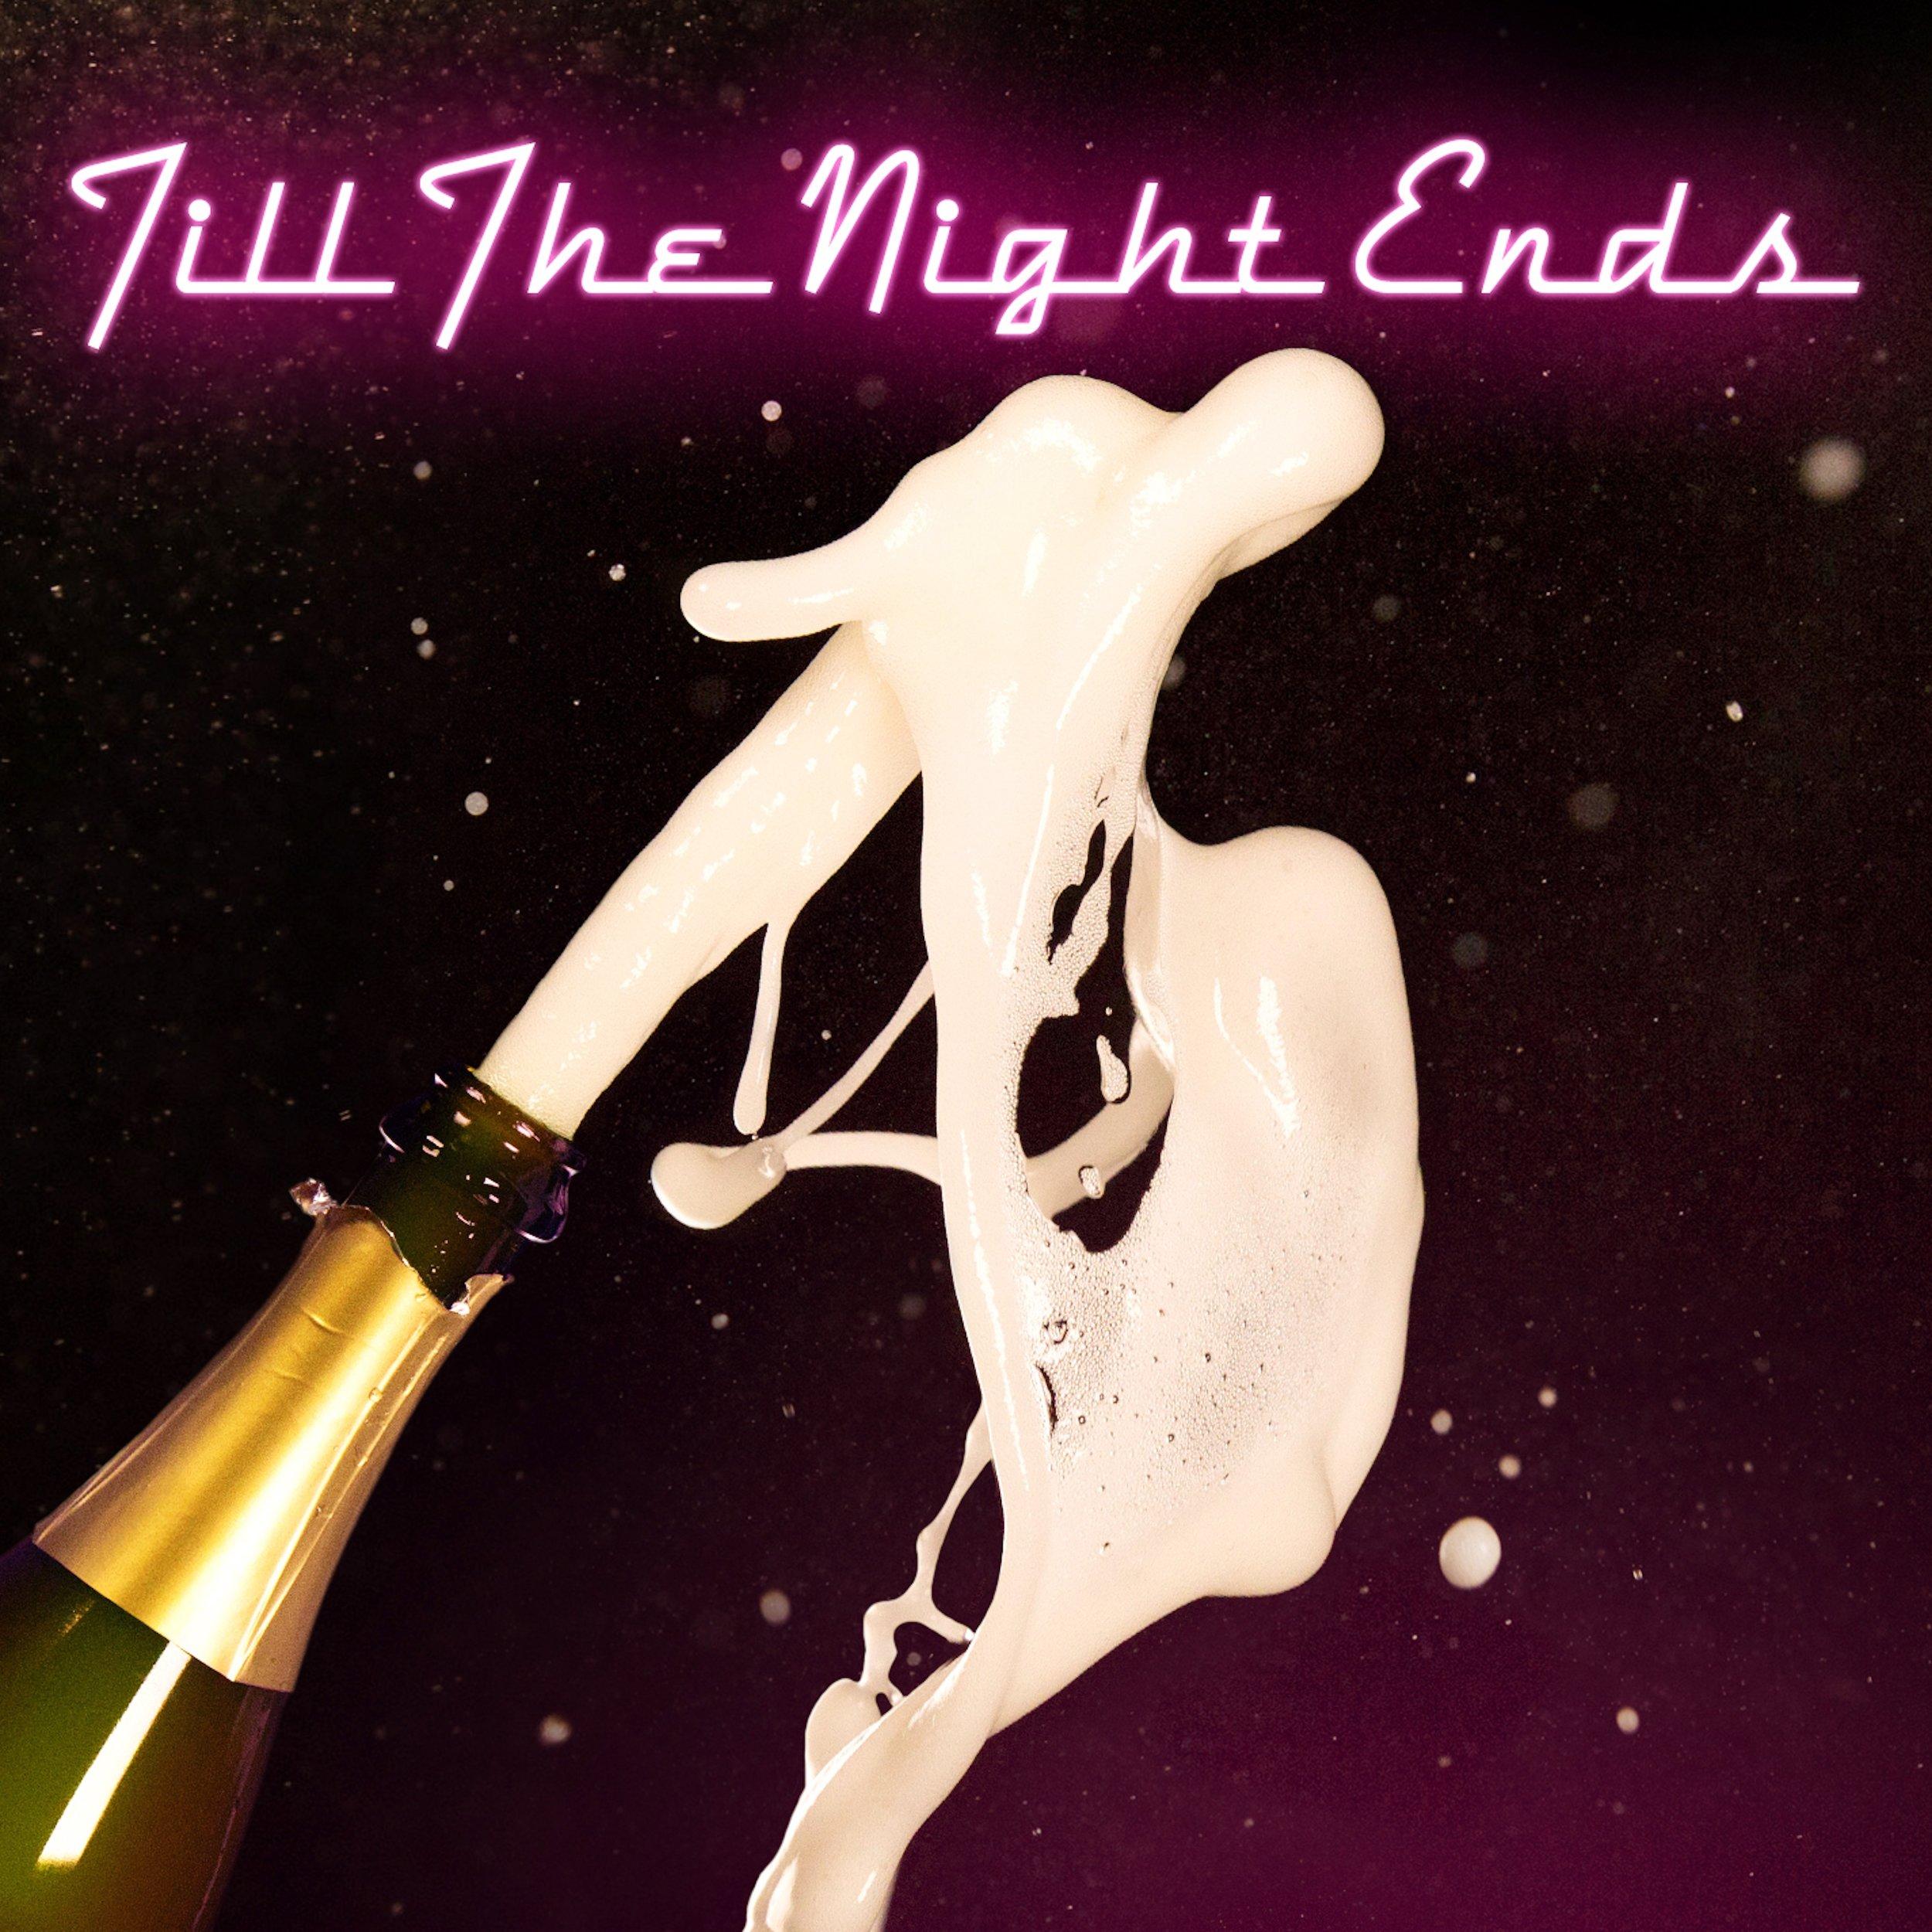 Till The Night Ends - Featuring: C Major & Maxine ChampionProduced by: Branko PezoMixed by: Joe SharrattMastered by: Matthew Gray